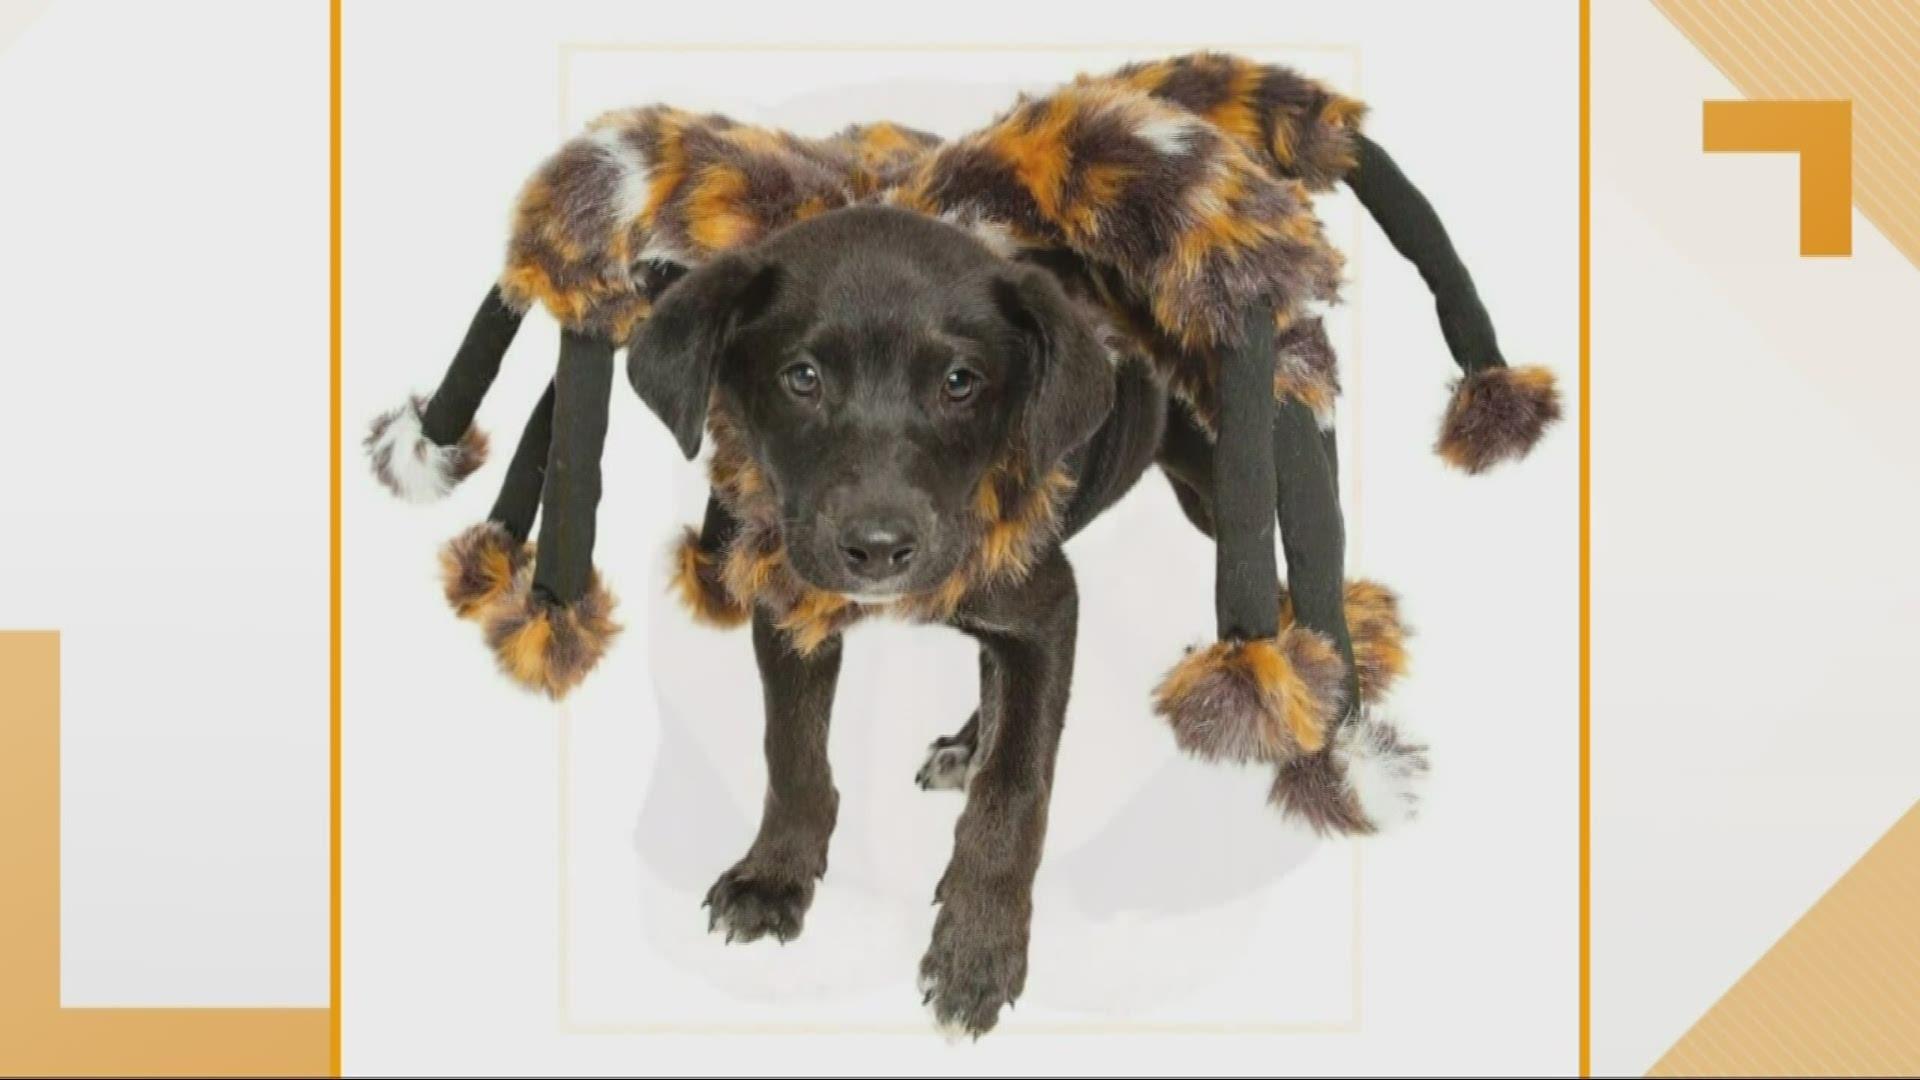 Harry Potter Dog Halloween Costumes.Best Halloween Dog Costumes For 2019 Batman Harry Potter Wcnc Com